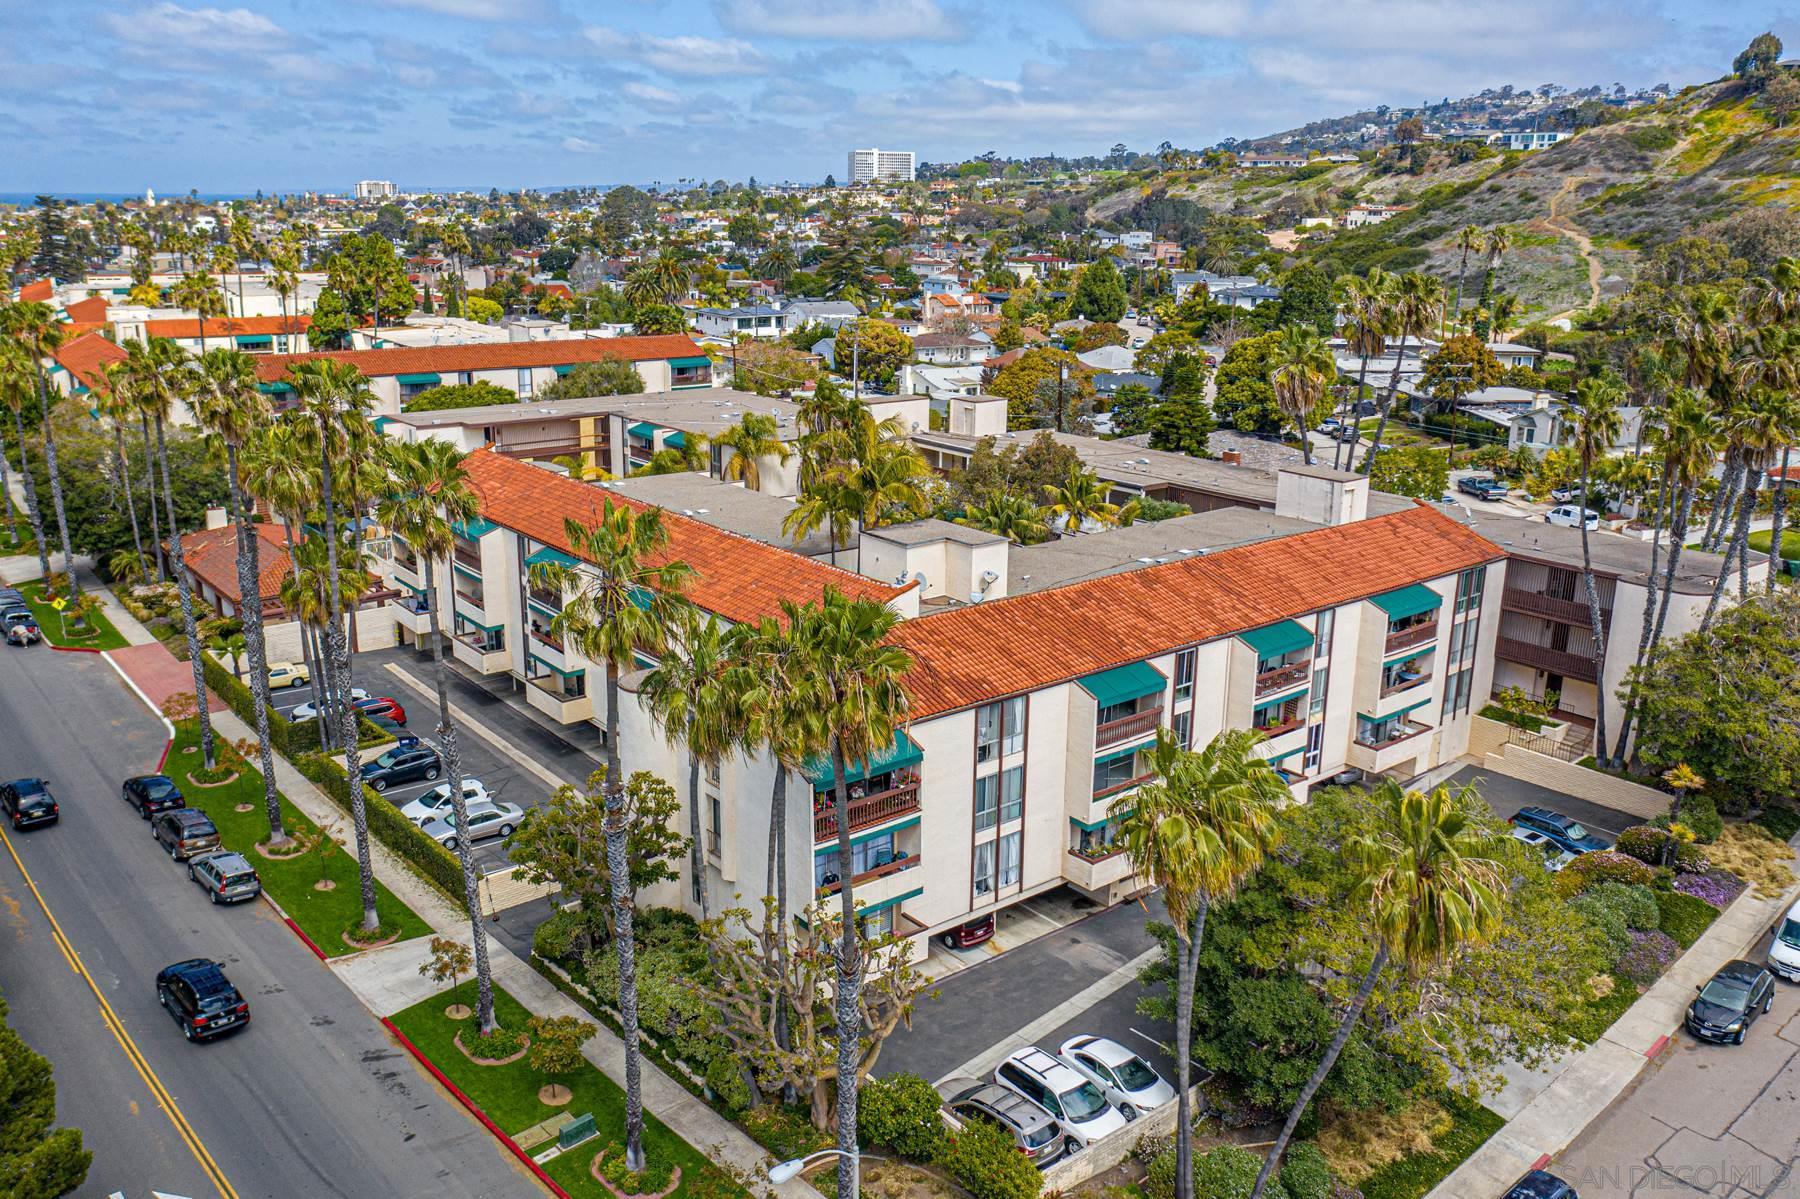 Photo of 6333 La Jolla Blvd #174, La Jolla, CA 92037